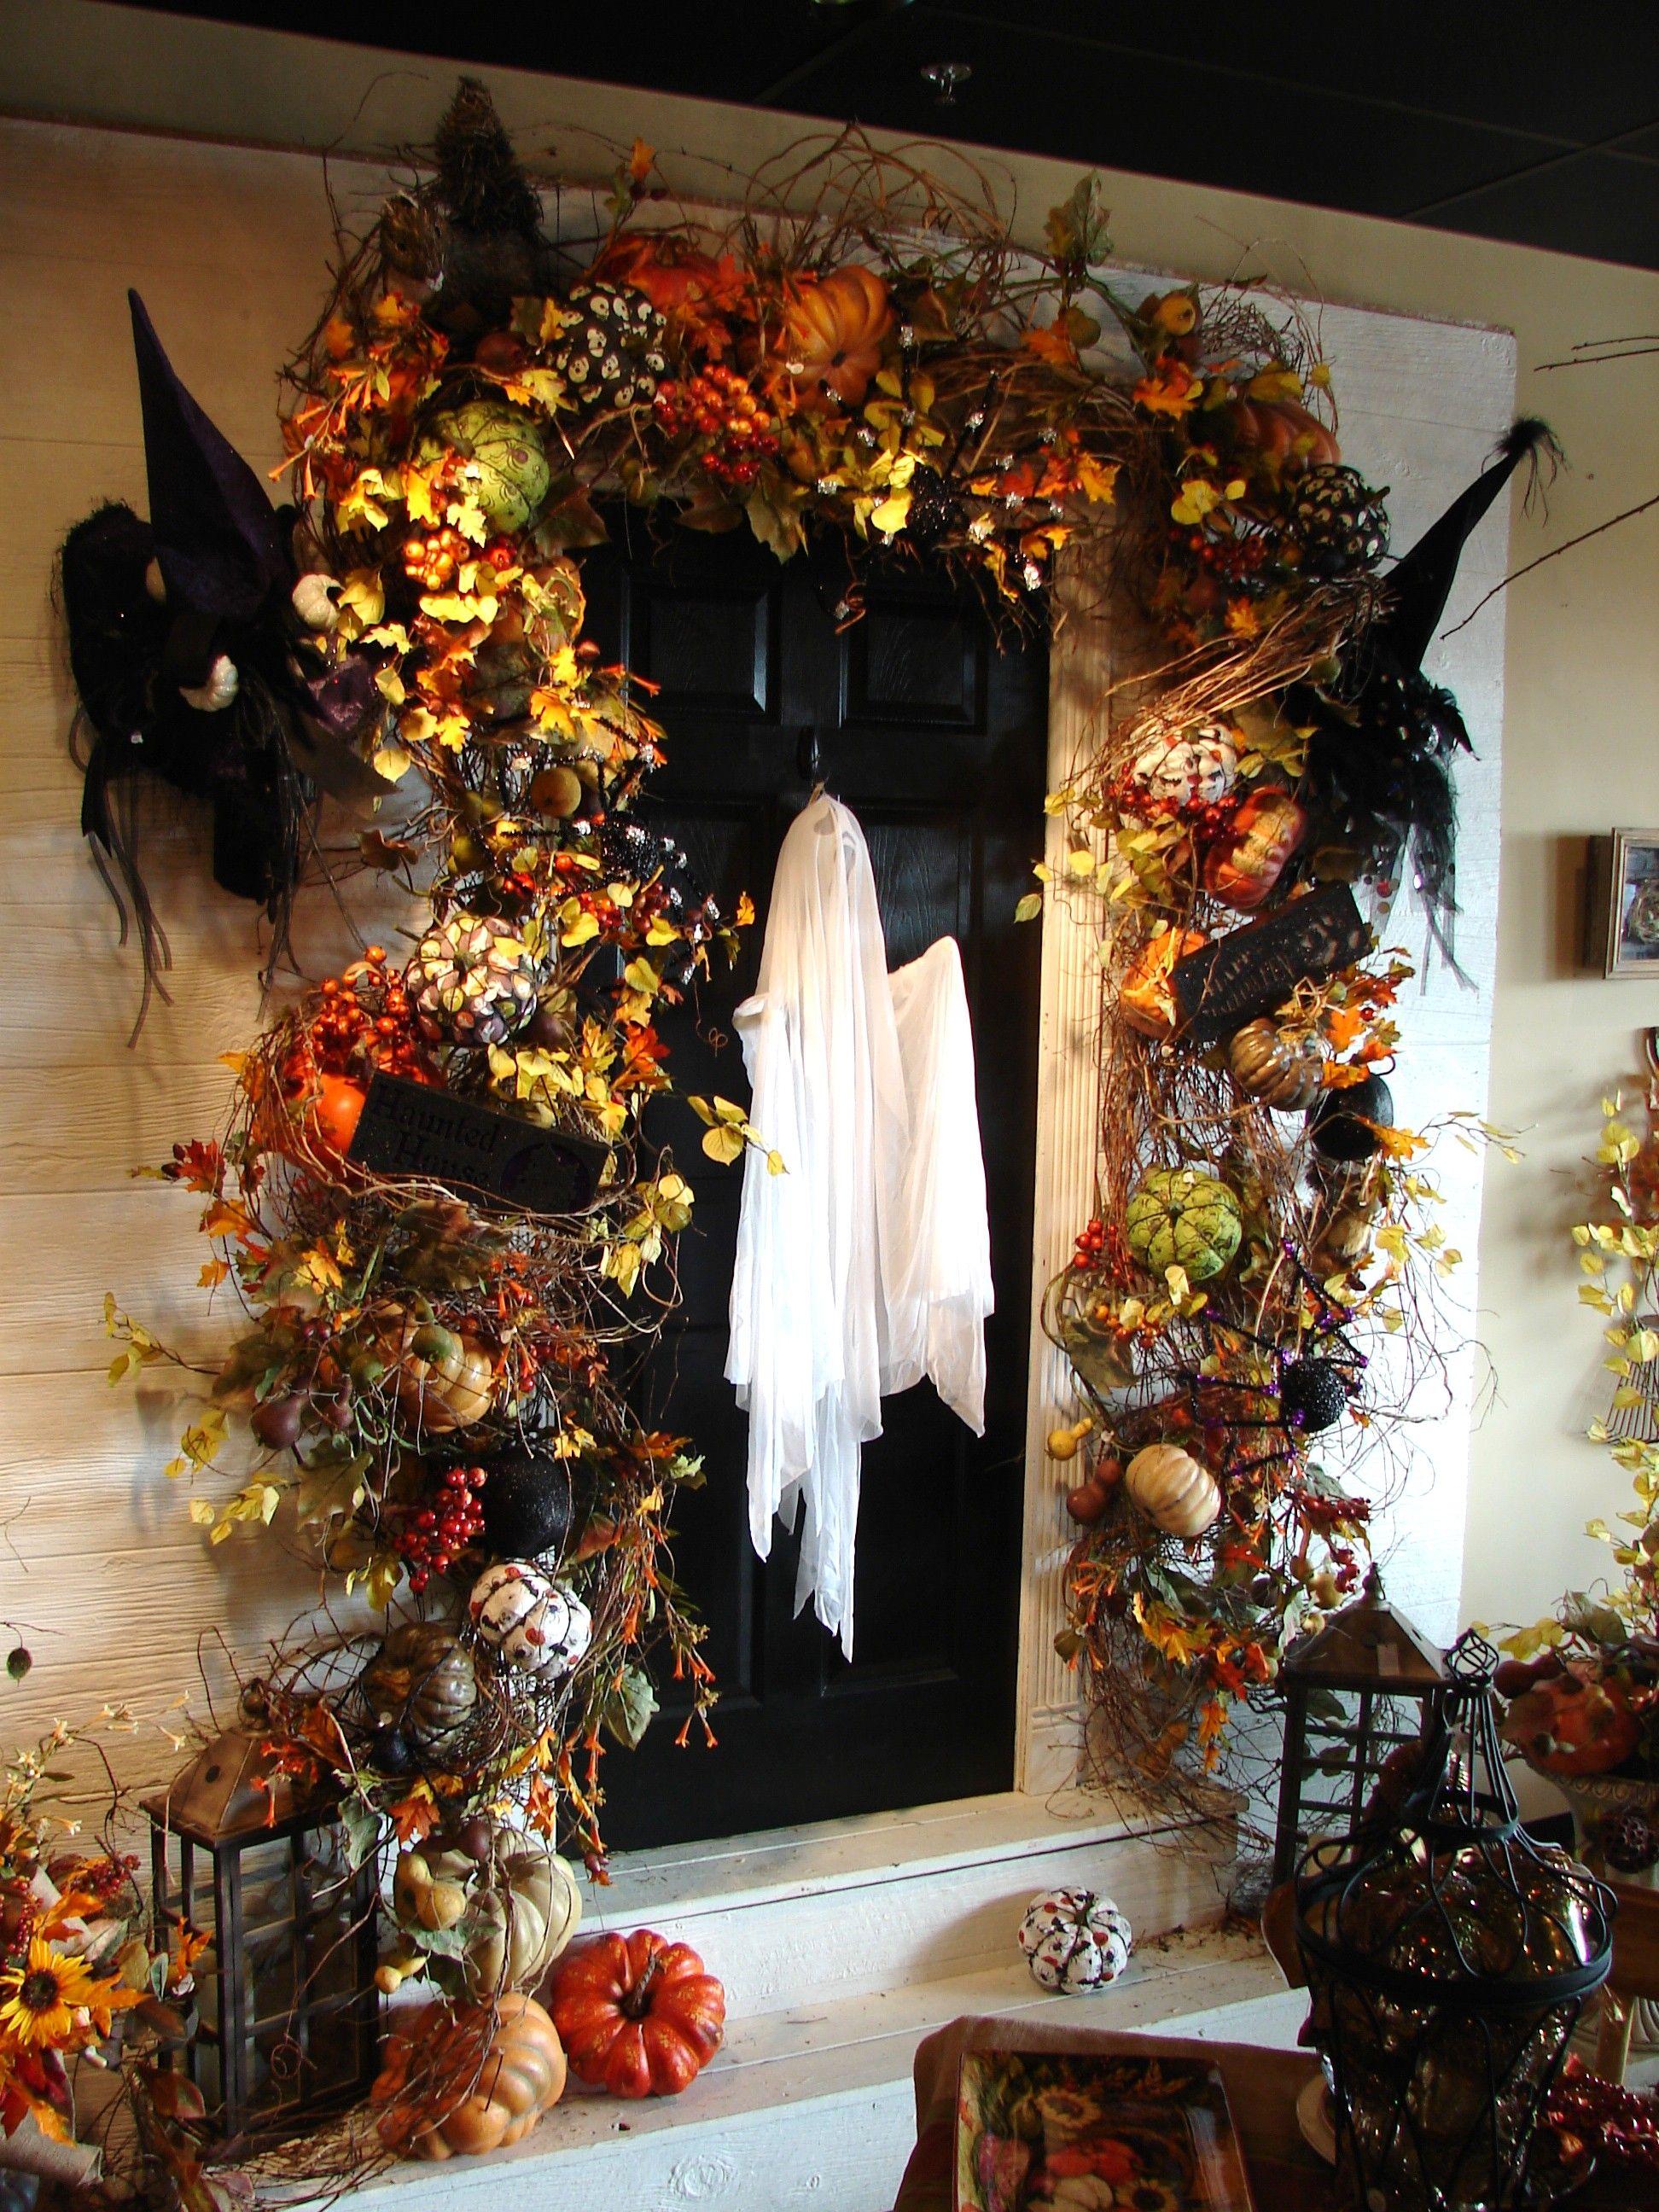 Honey suckle and Halloween decor used around your front door - front door halloween decorations